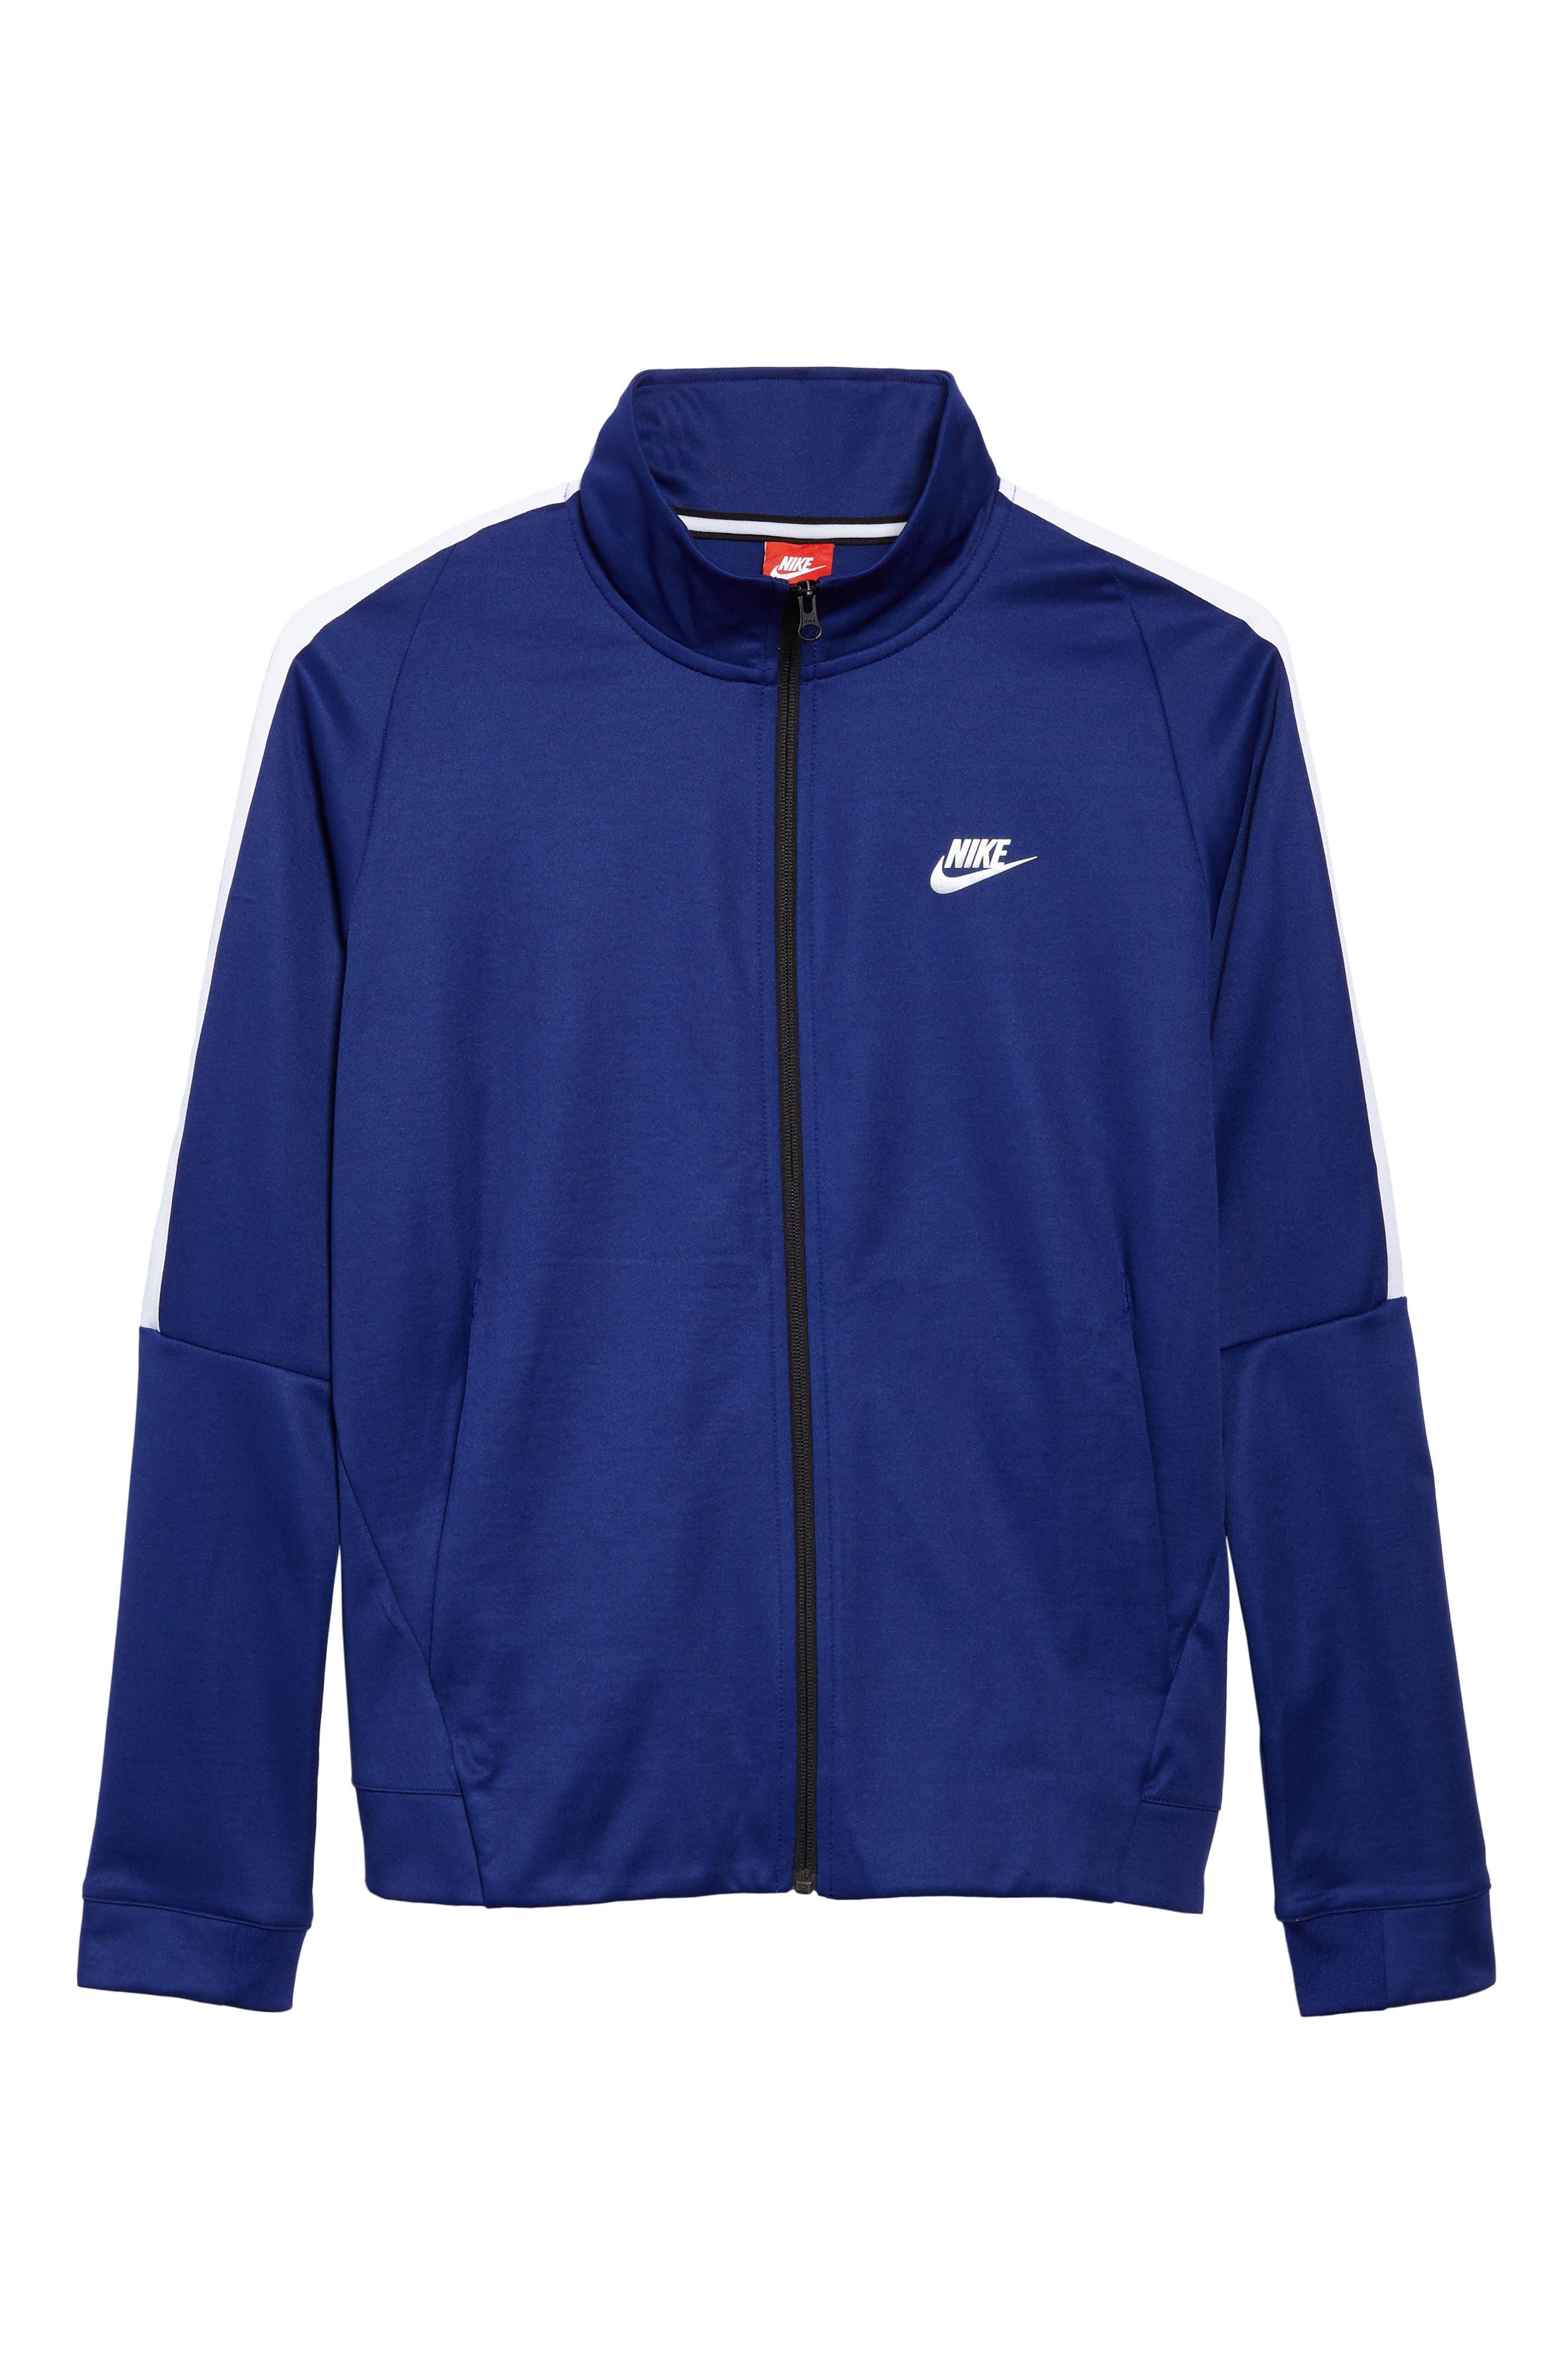 Sportswear Zip Track Jacket,                             Alternate thumbnail 6, color,                             DEEP ROYAL BLUE/ WHITE/ BLACK